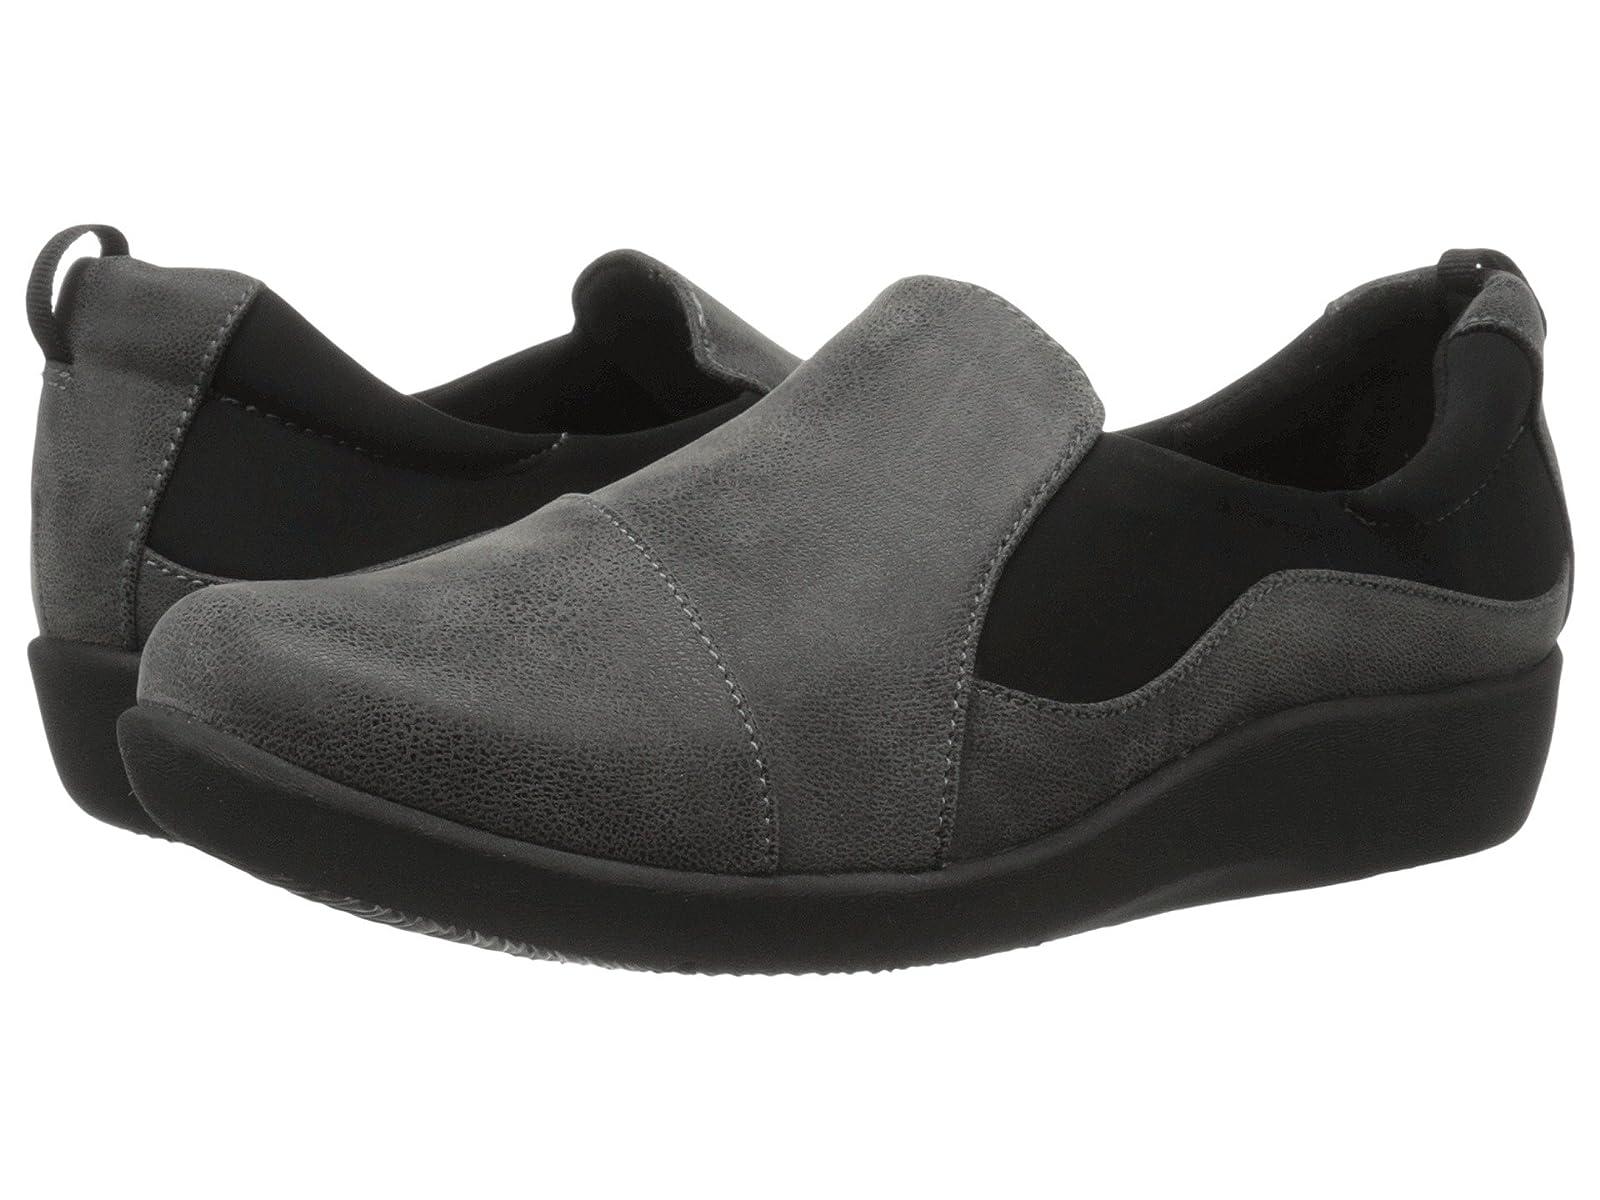 Clarks Sillian PazAtmospheric grades have affordable shoes